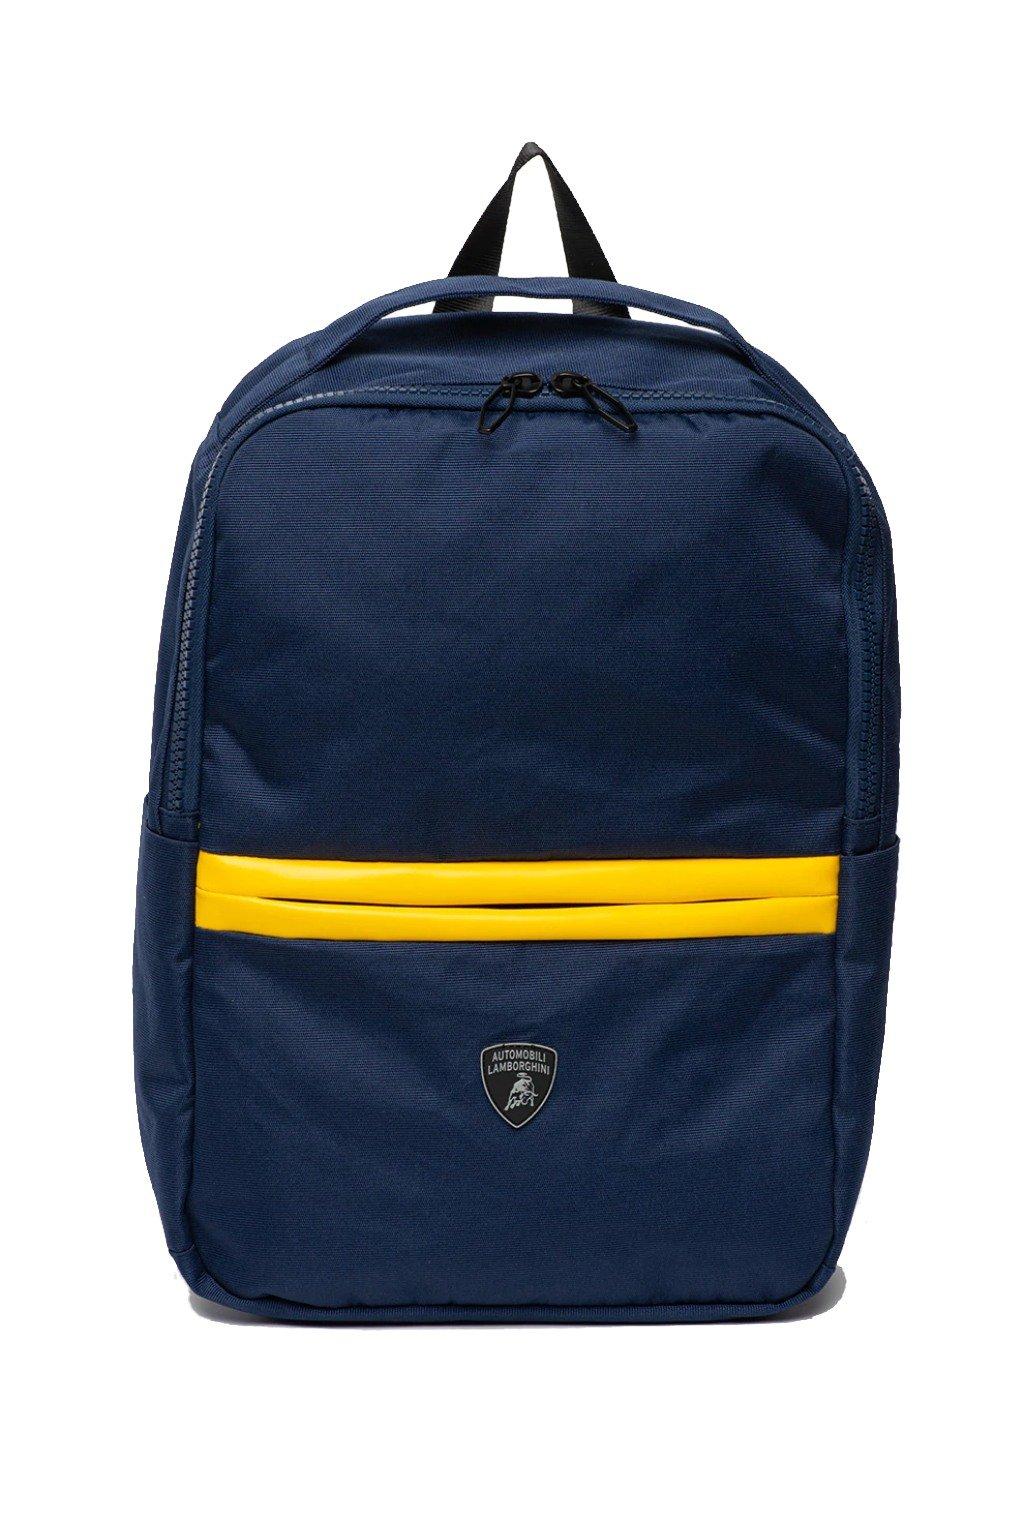 Pásnké batohy Lamborghini ruksak znackove batohy lamborghini auta superauta batohy sportovni batohy batohy pro muze doplnky lamborghini praha panska moda cerny batoh cerny pansky batoh tmave modry zlute lamborghini bl (11)